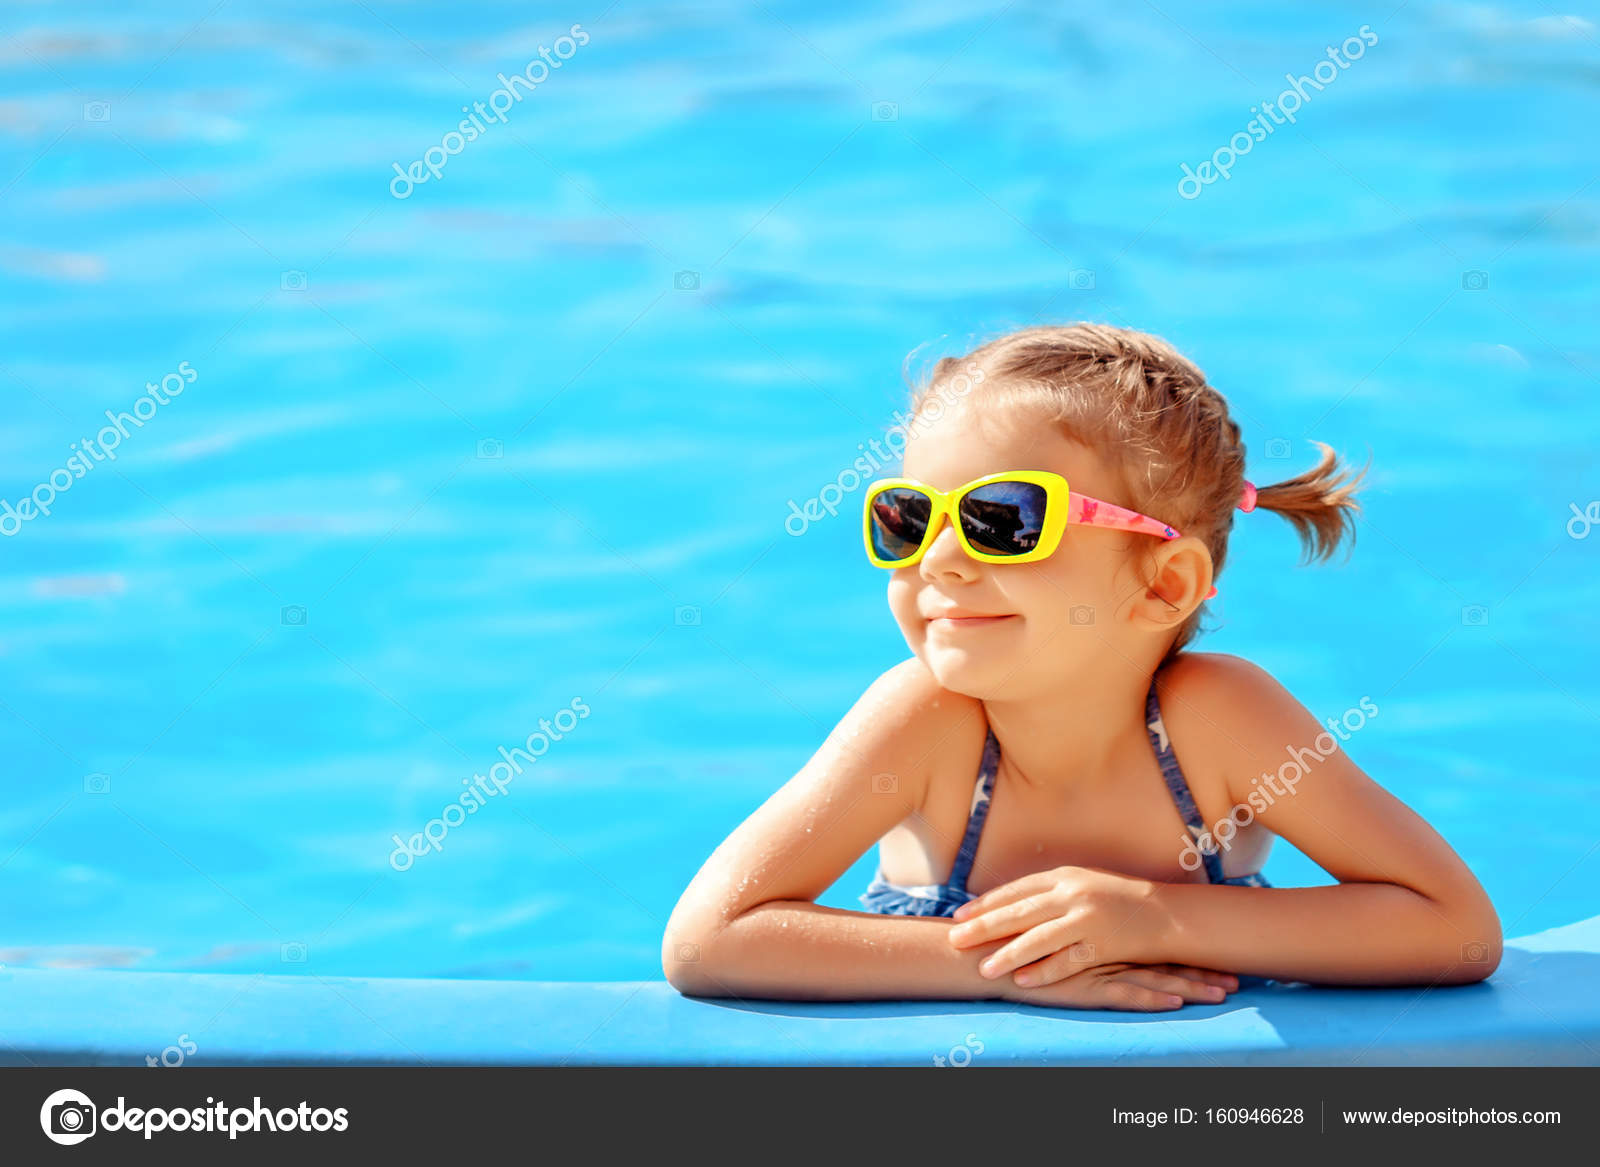 f9f00bbdc0 Χαμογελώντας χαριτωμένο κοριτσάκι σε γυαλιά ηλίου στην πισίνα στην  ηλιόλουστη μέρα — Εικόνα από ...